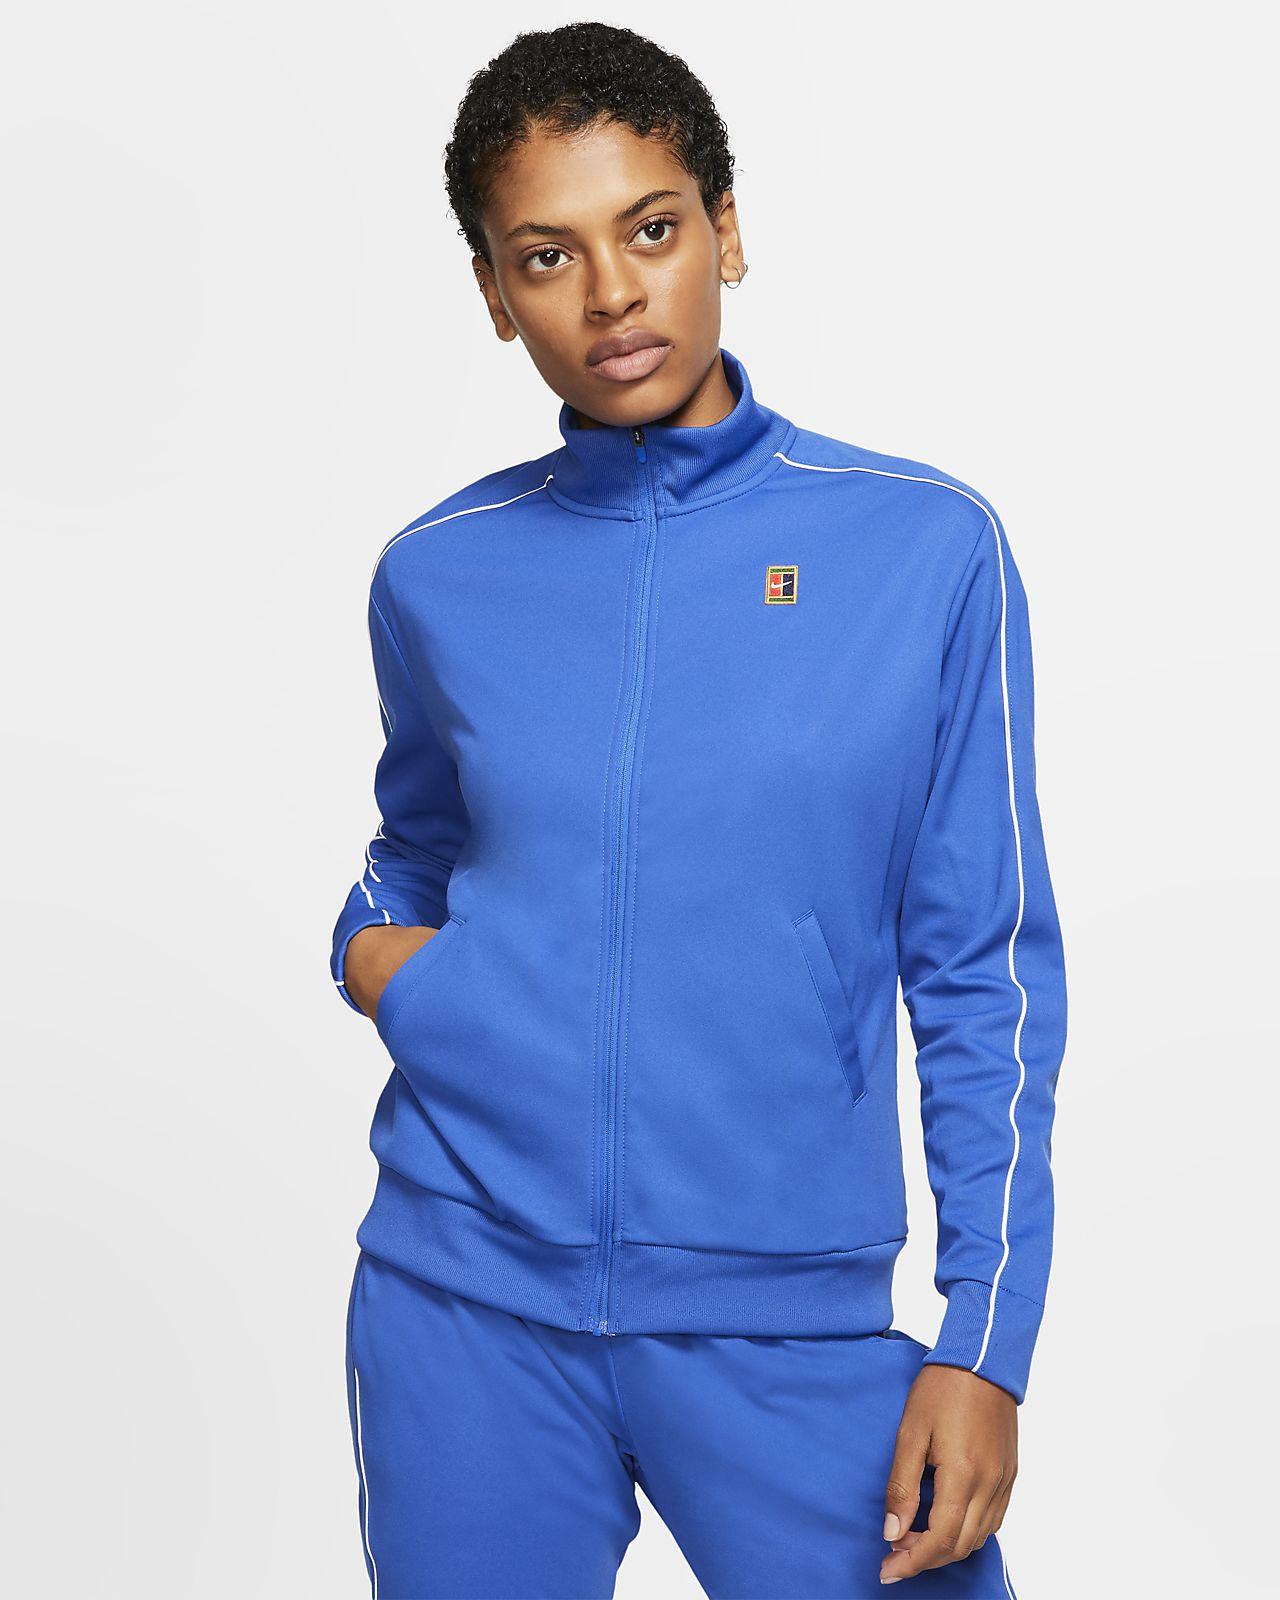 Chamarra de tenis NikeCourt para mujer